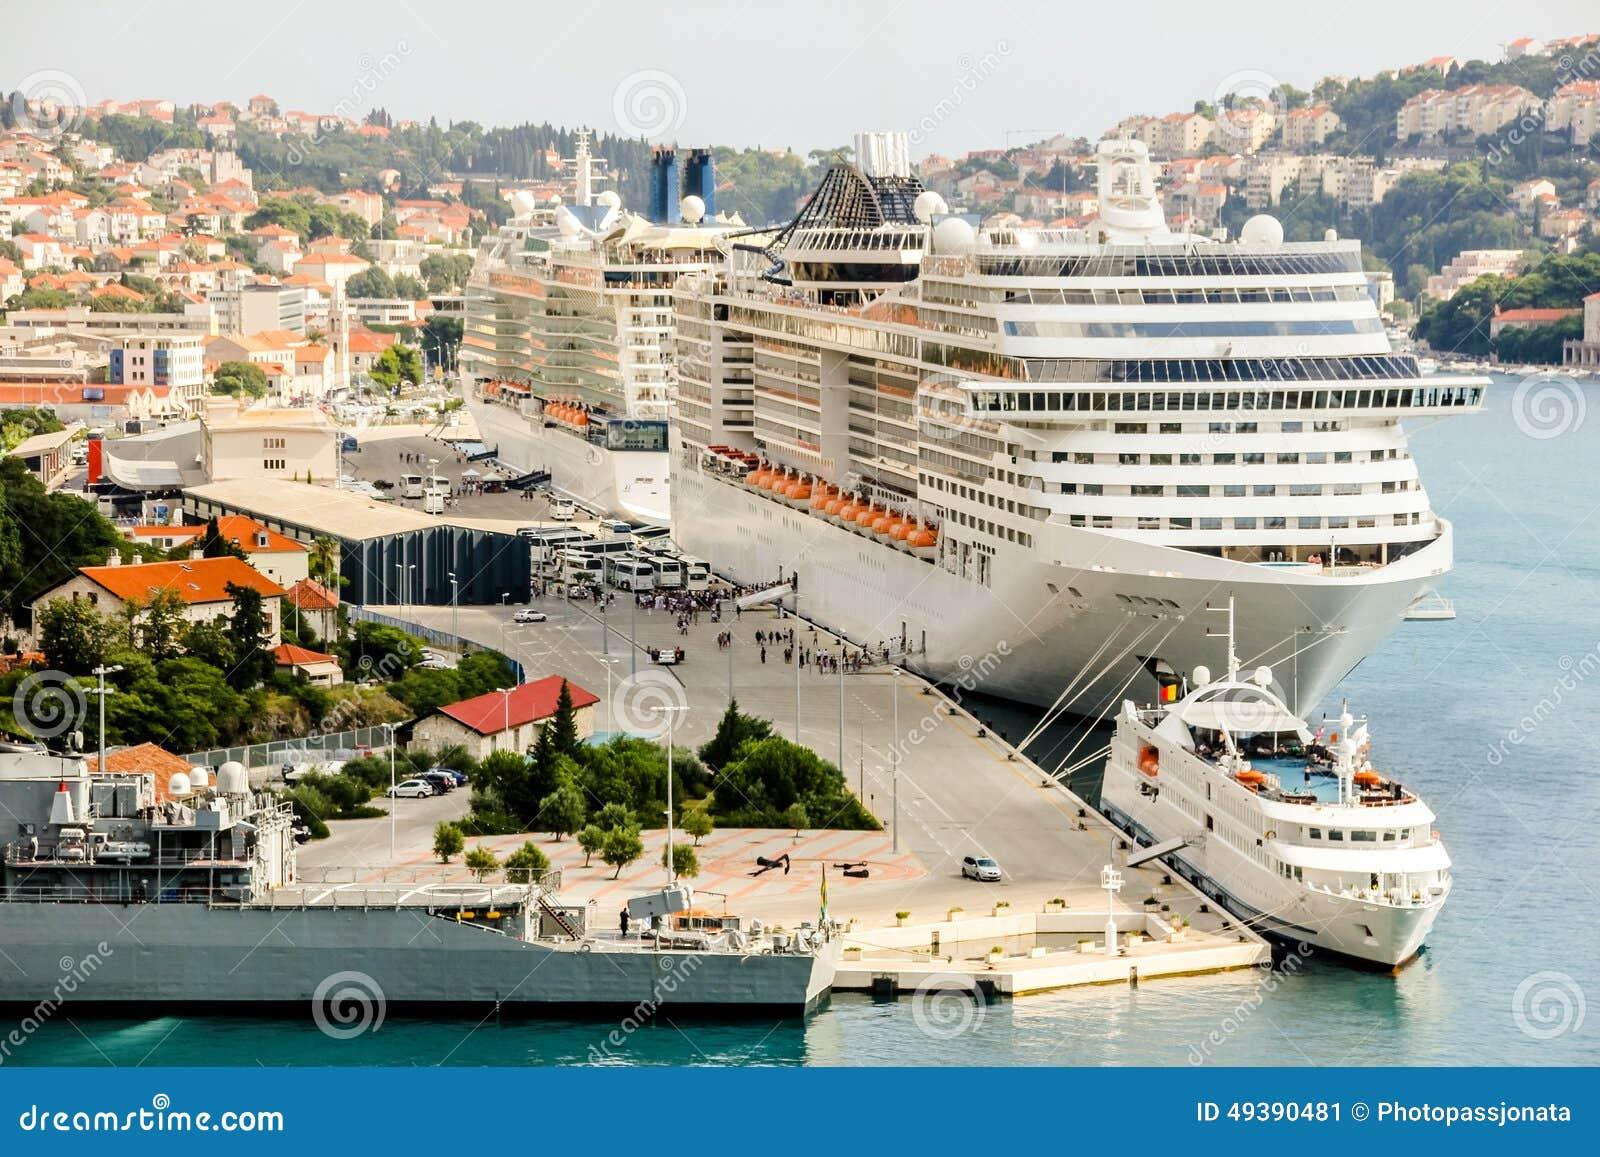 Large cruise ships in harbour Dubrovnik, Lapad peninsula, Dalmatia ...